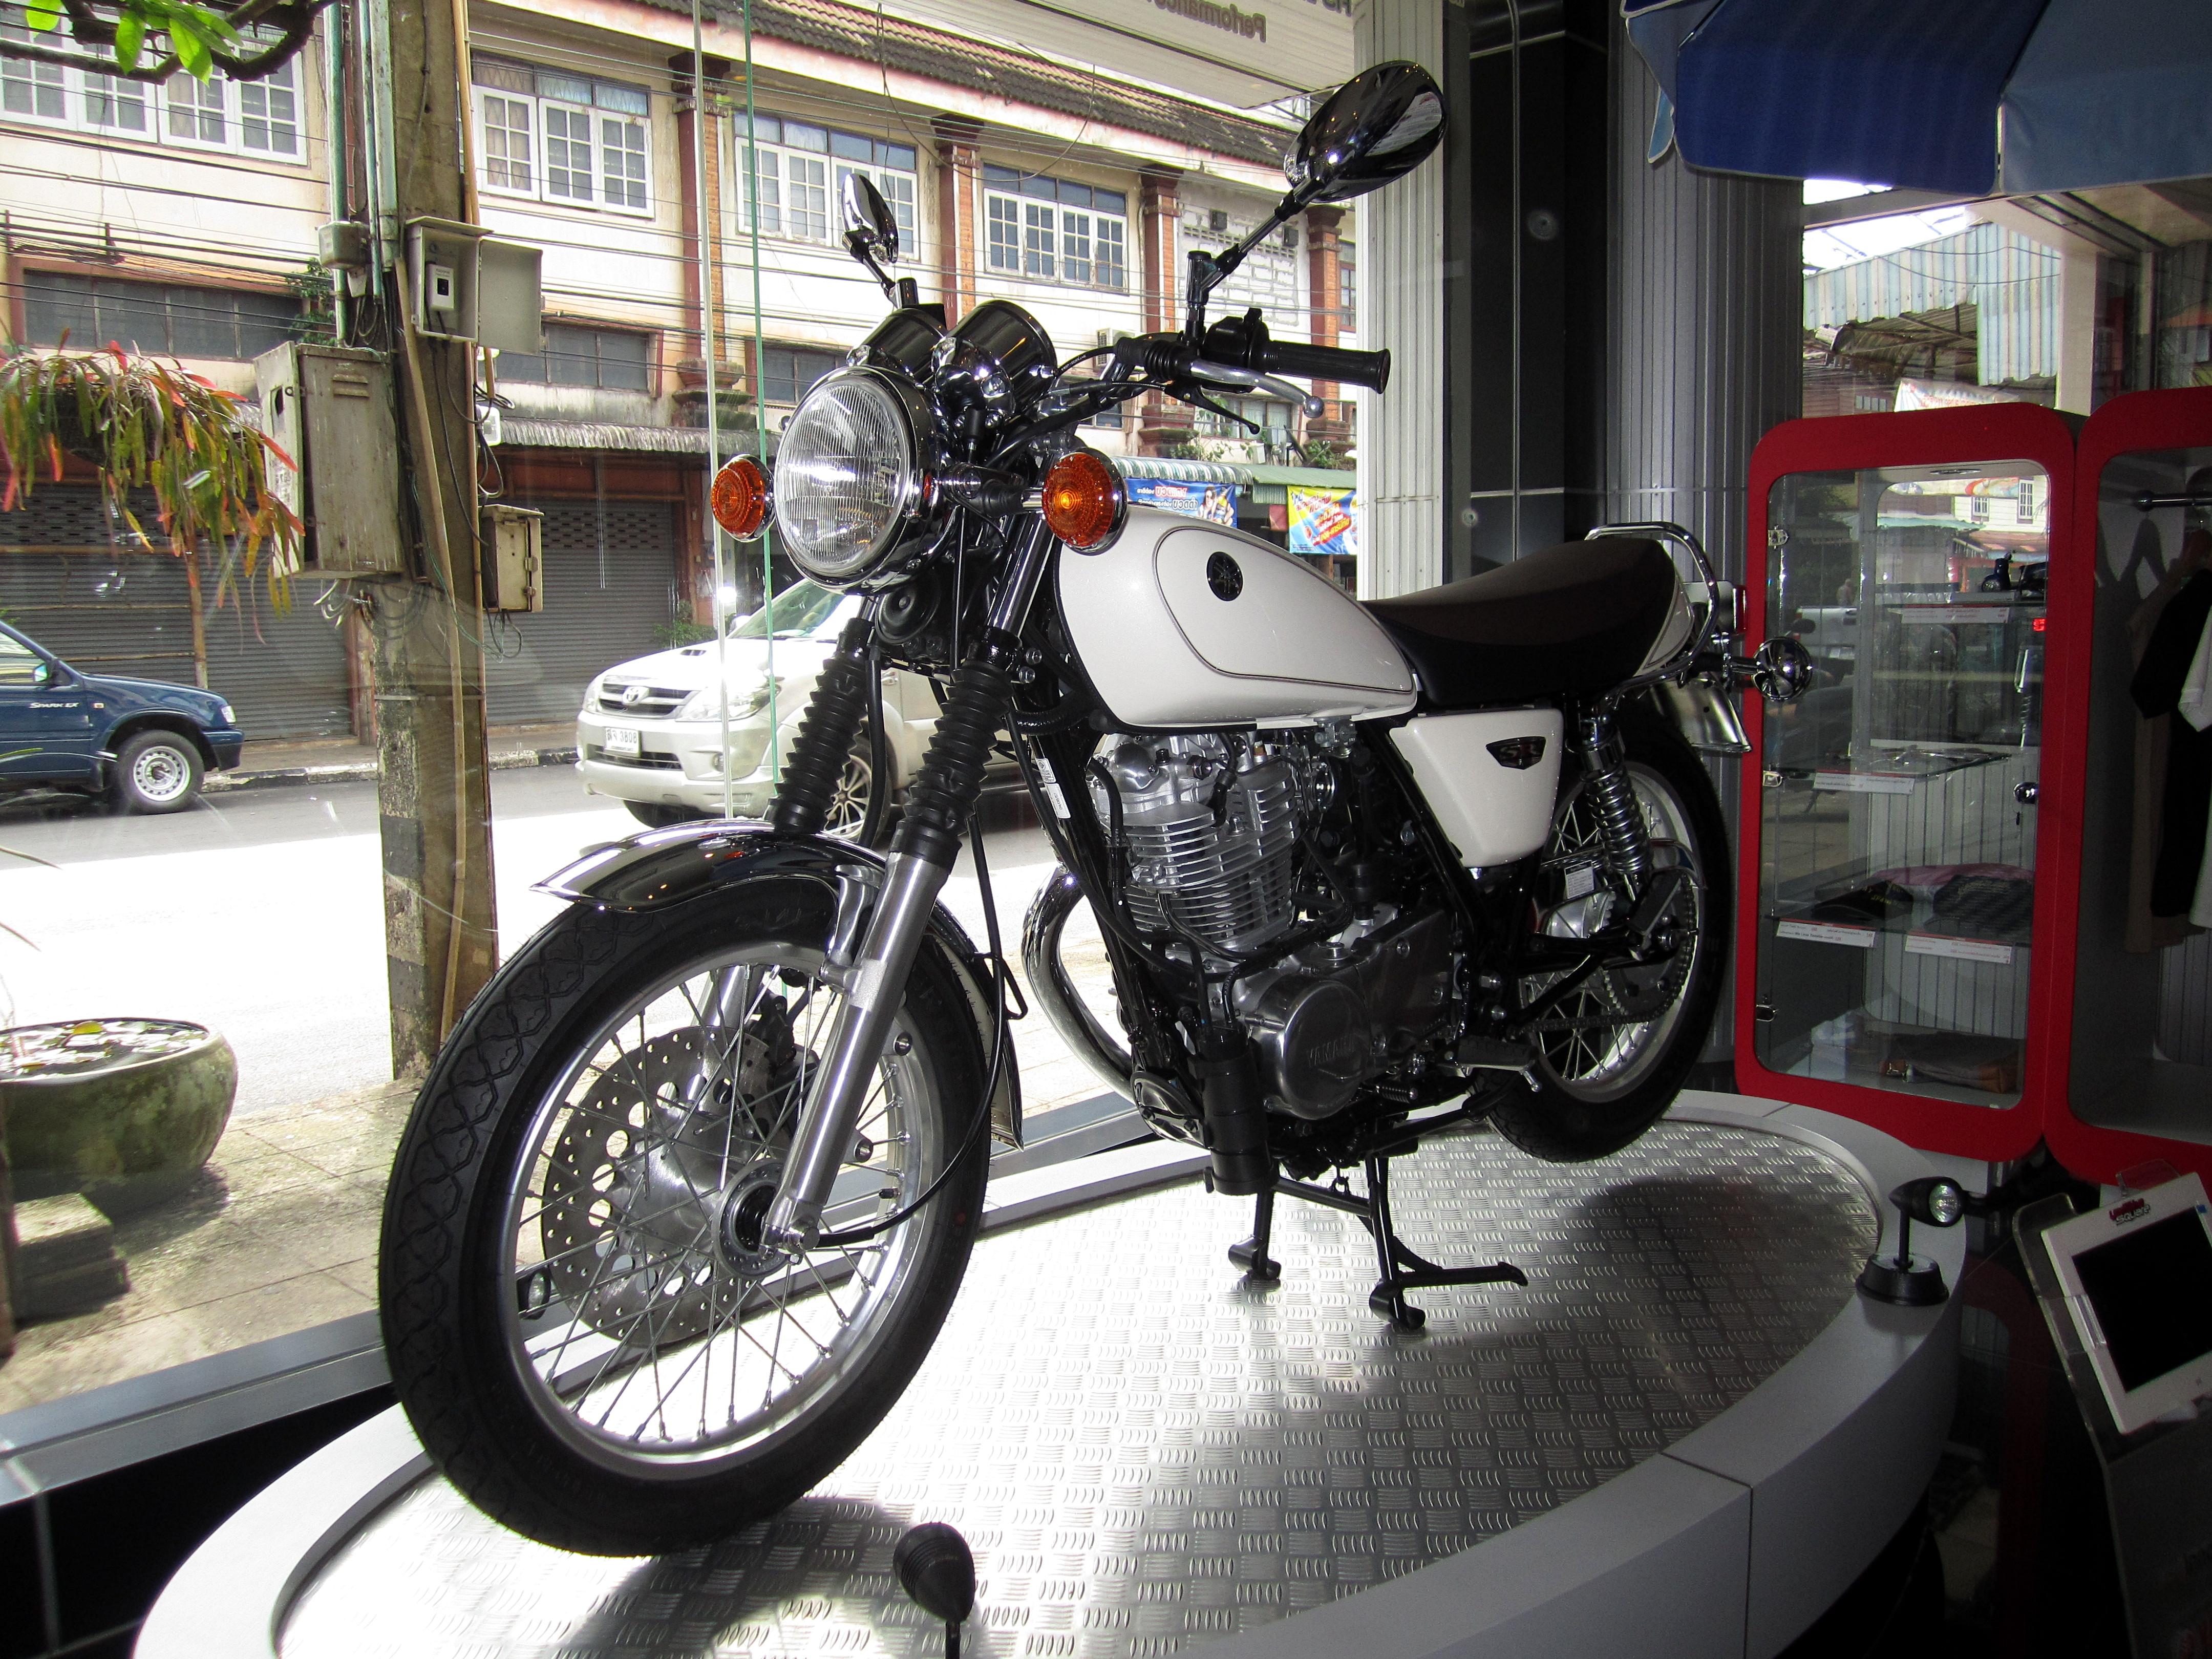 File:Yamaha SR400 Motorcycle 2014.JPG - Wikimedia Commons